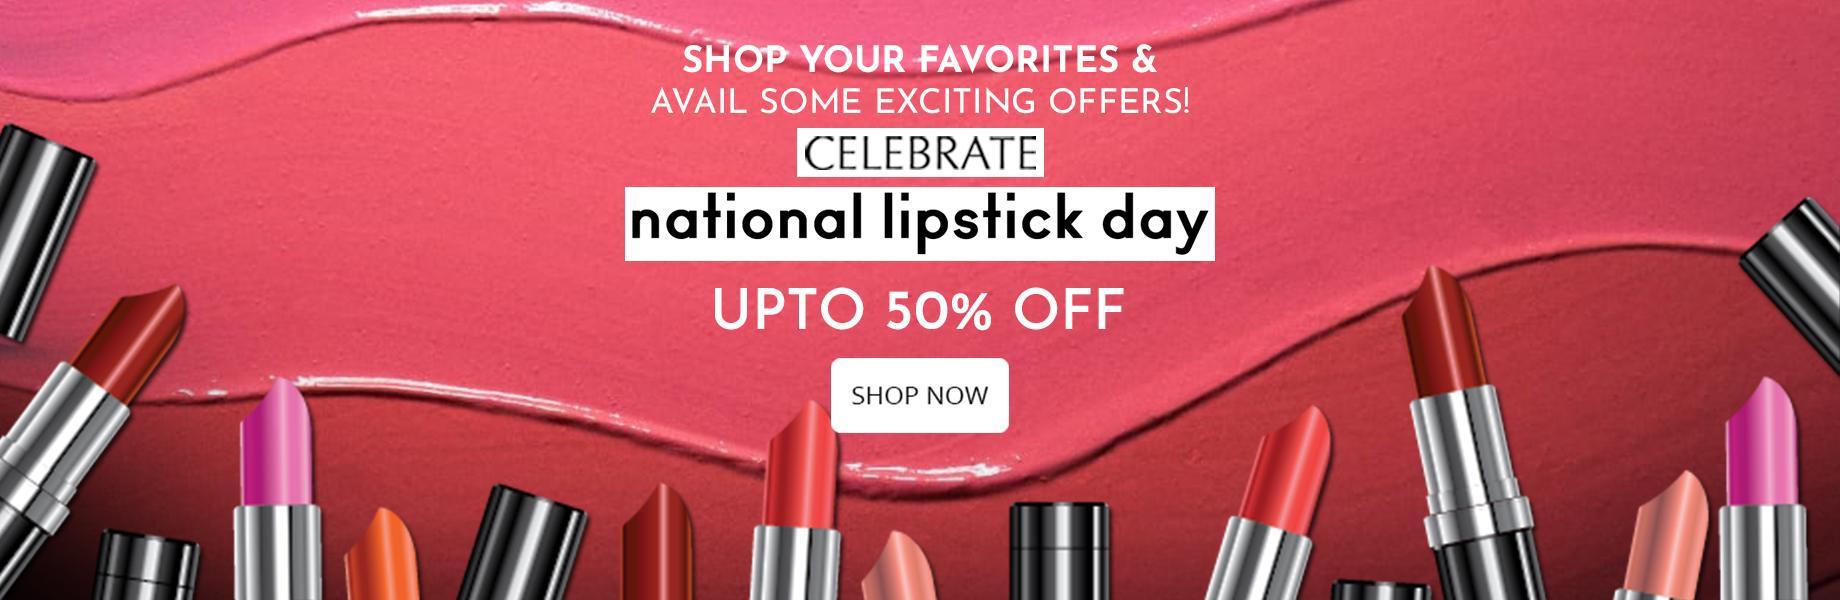 lipstick_web.jpg